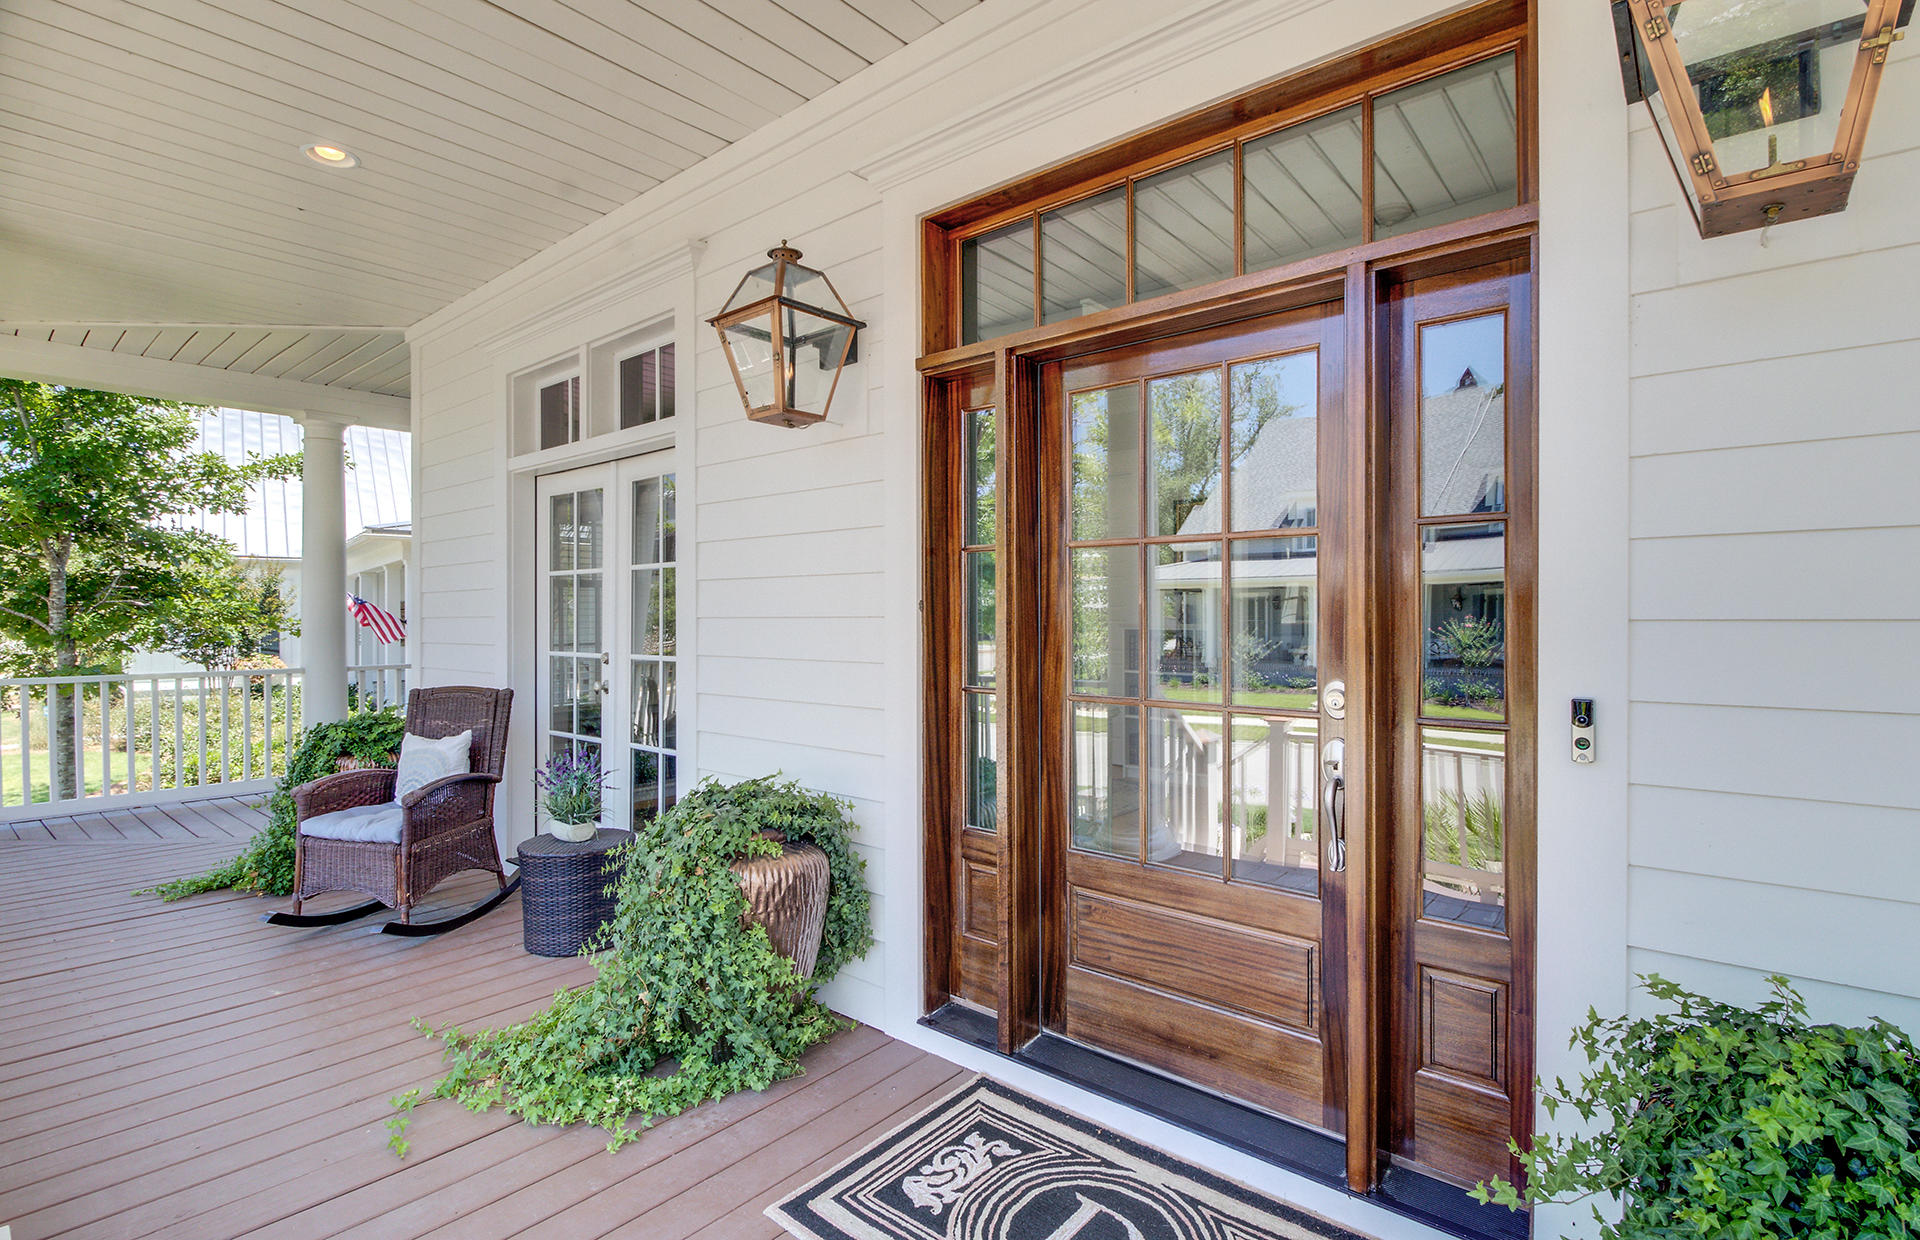 Daniel Island Homes For Sale - 135 Brailsford, Charleston, SC - 63